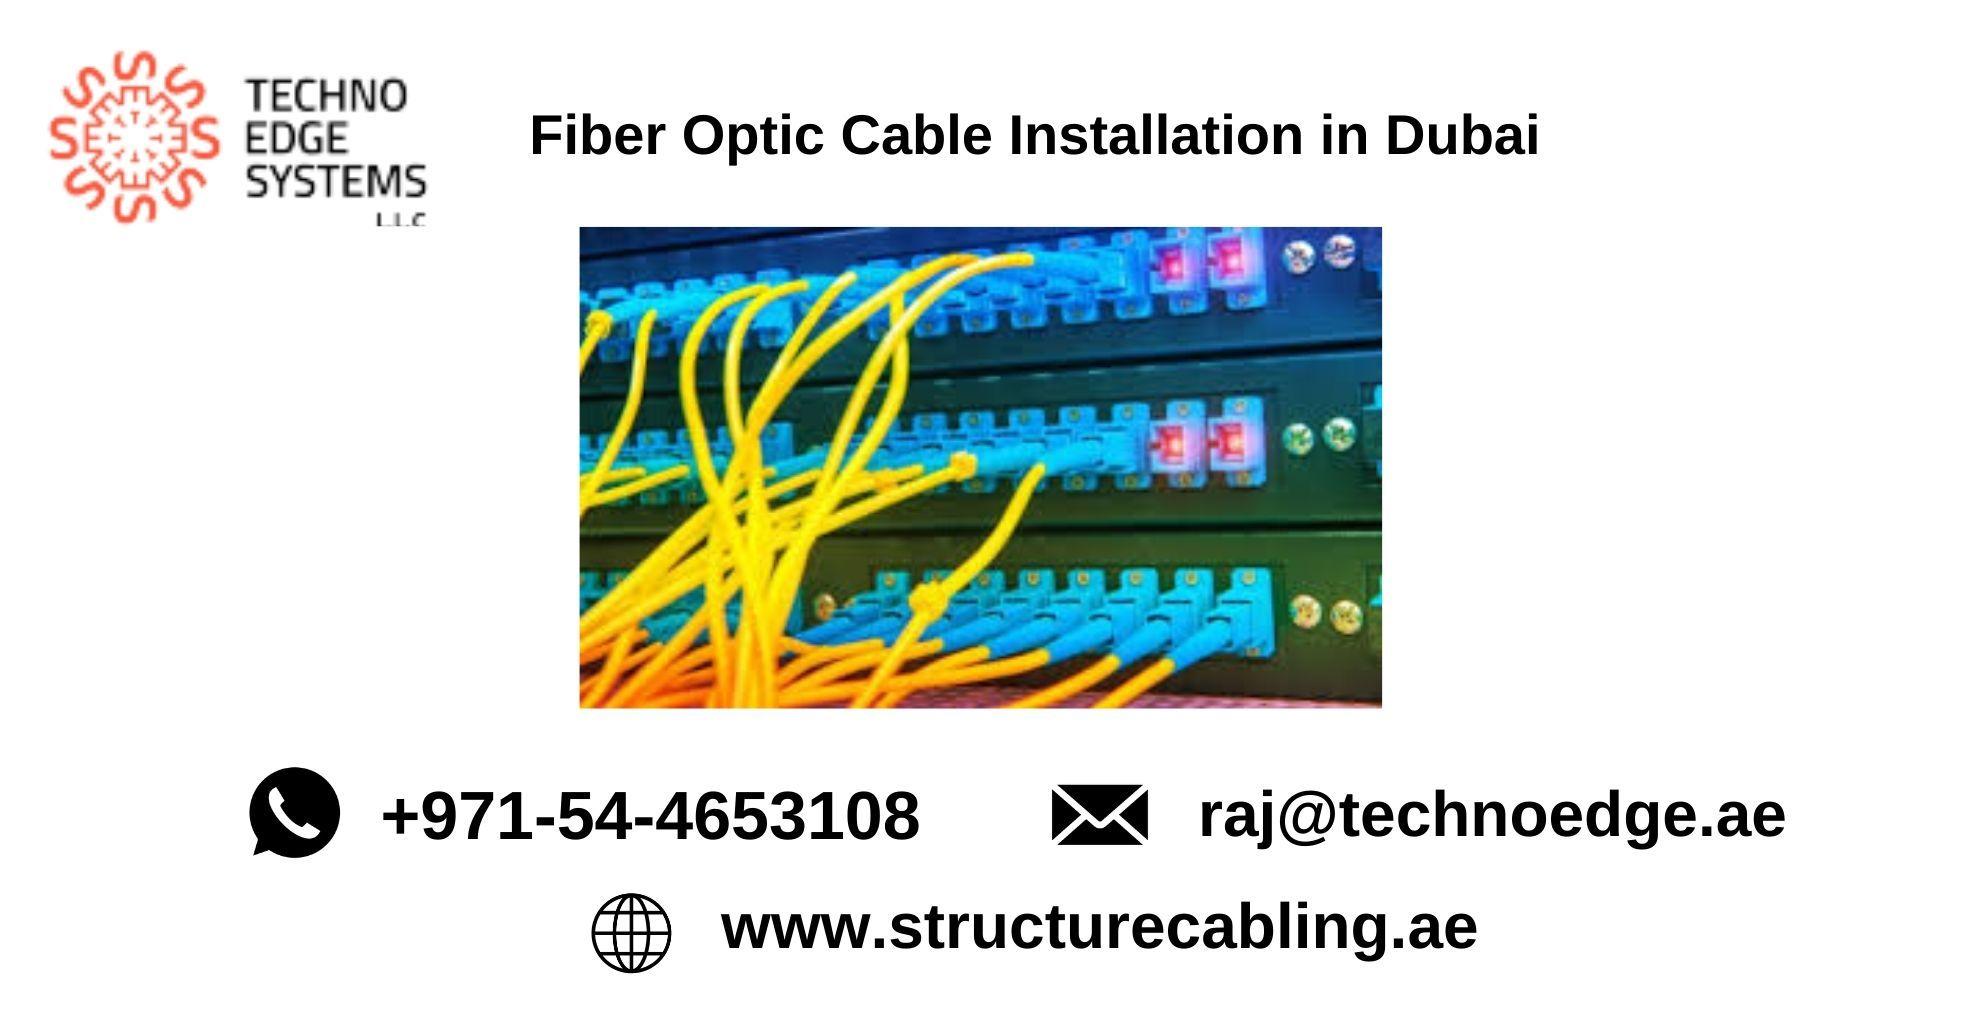 Fiber Optic Cabling in Dubai Fiber Optic Cable